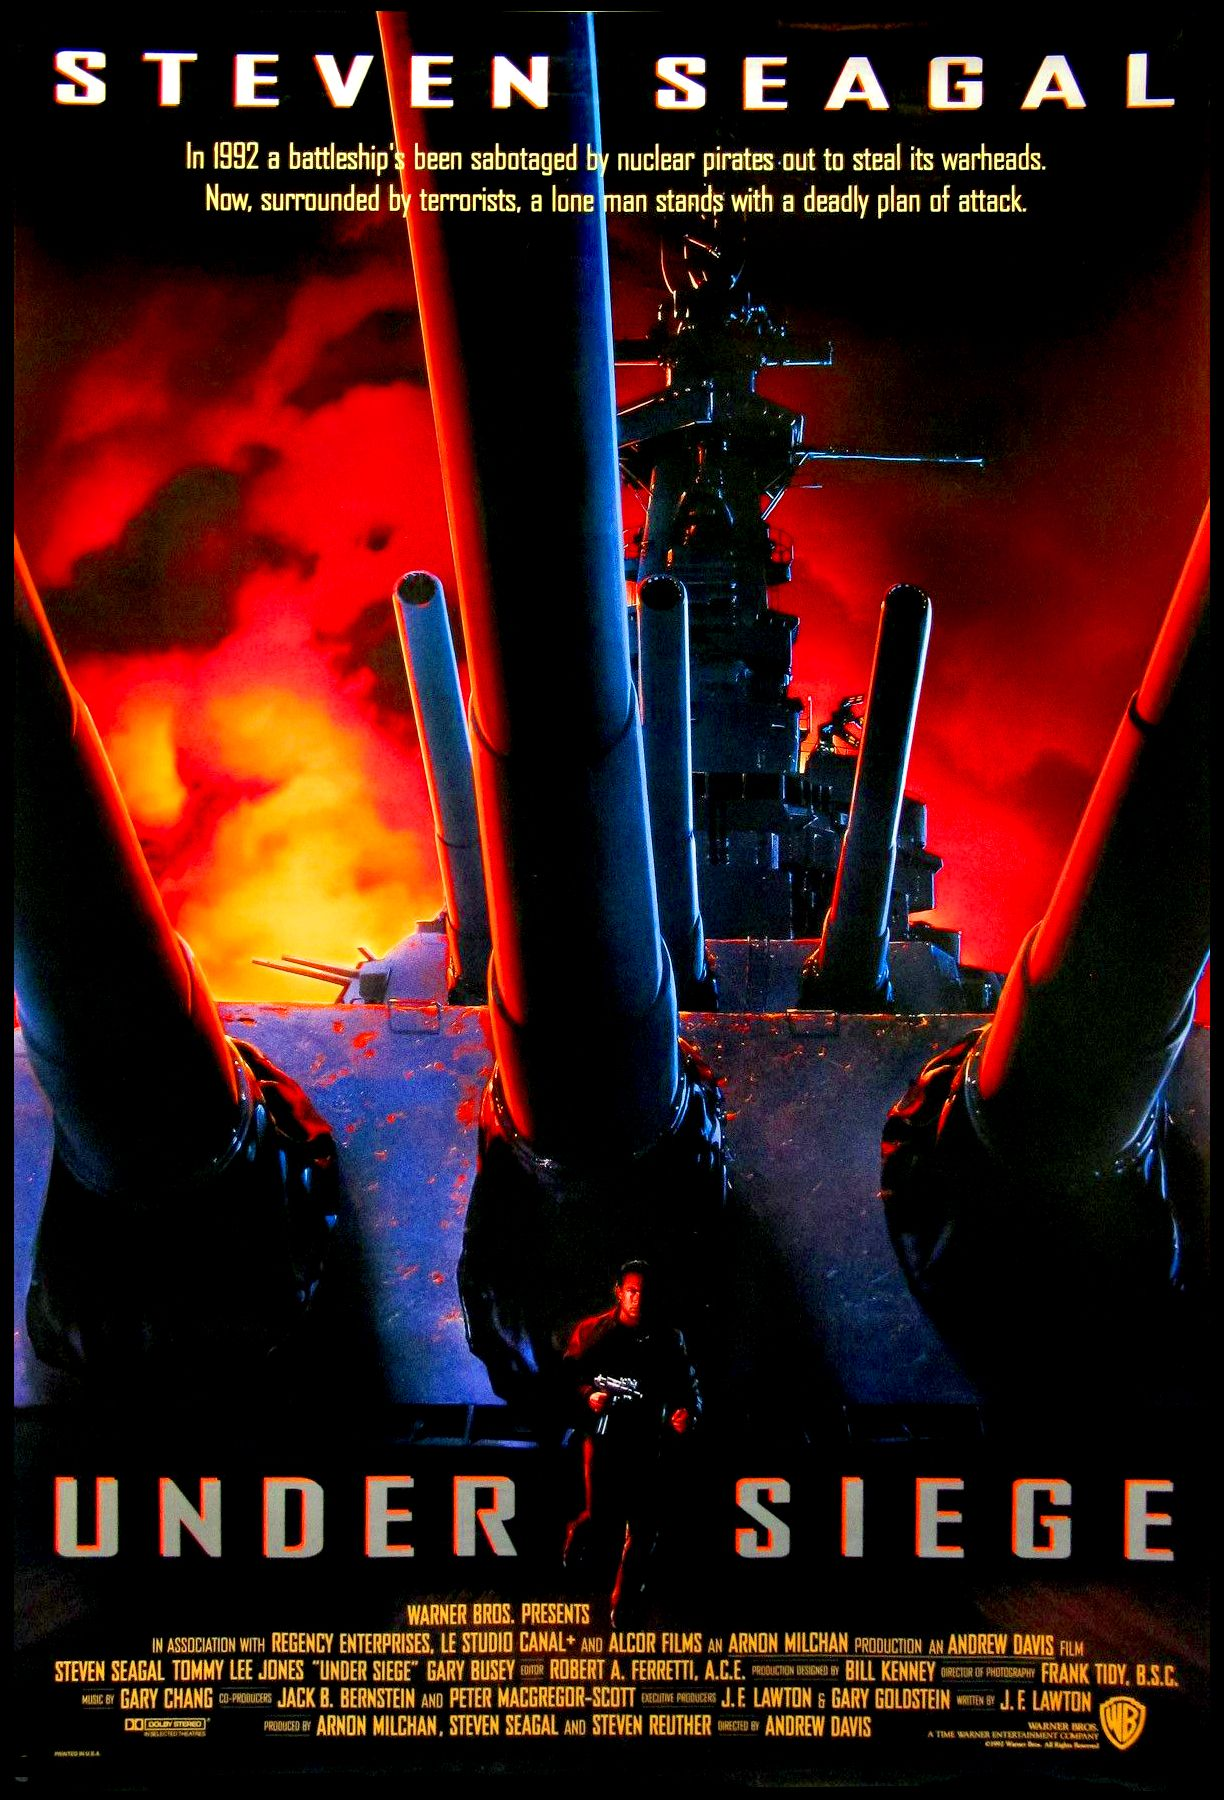 Pin By Mark Mark On Steven Seagal Steven Seagal Film Sci Fi Movies